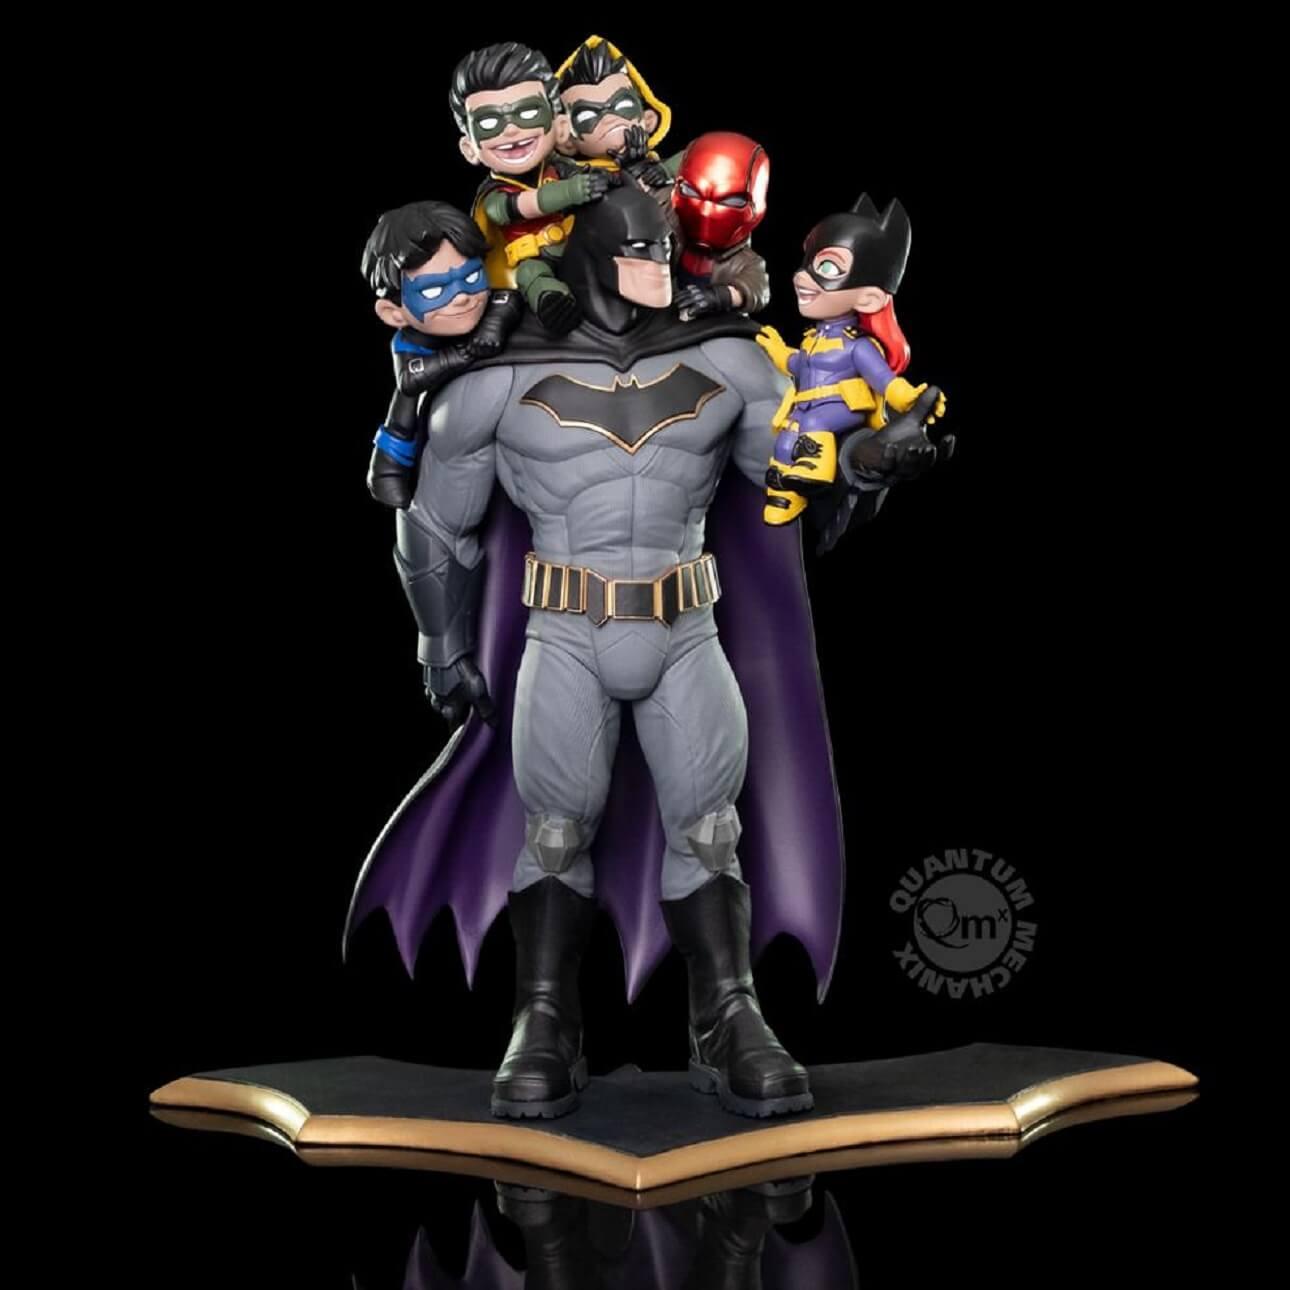 bat family statue.jpg